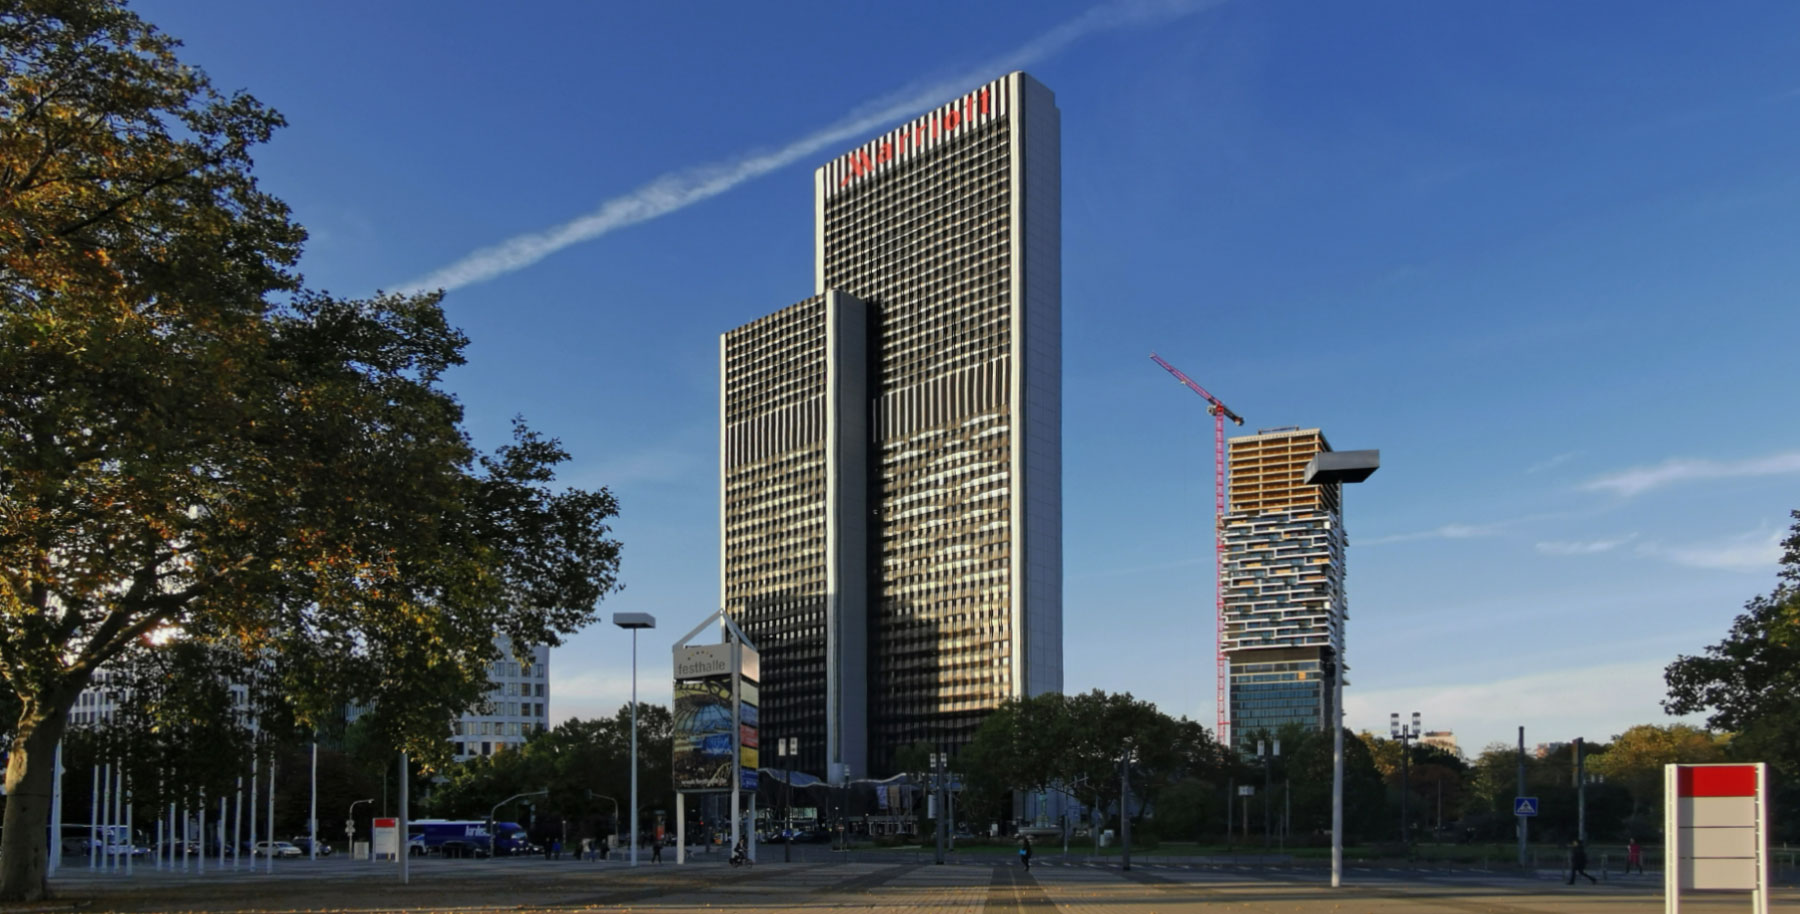 Westendgate Frankfurt - Westend Gate Frankfurt am Main - former PBC Plaza Büro Center - Marriott Hotel Frankfurt